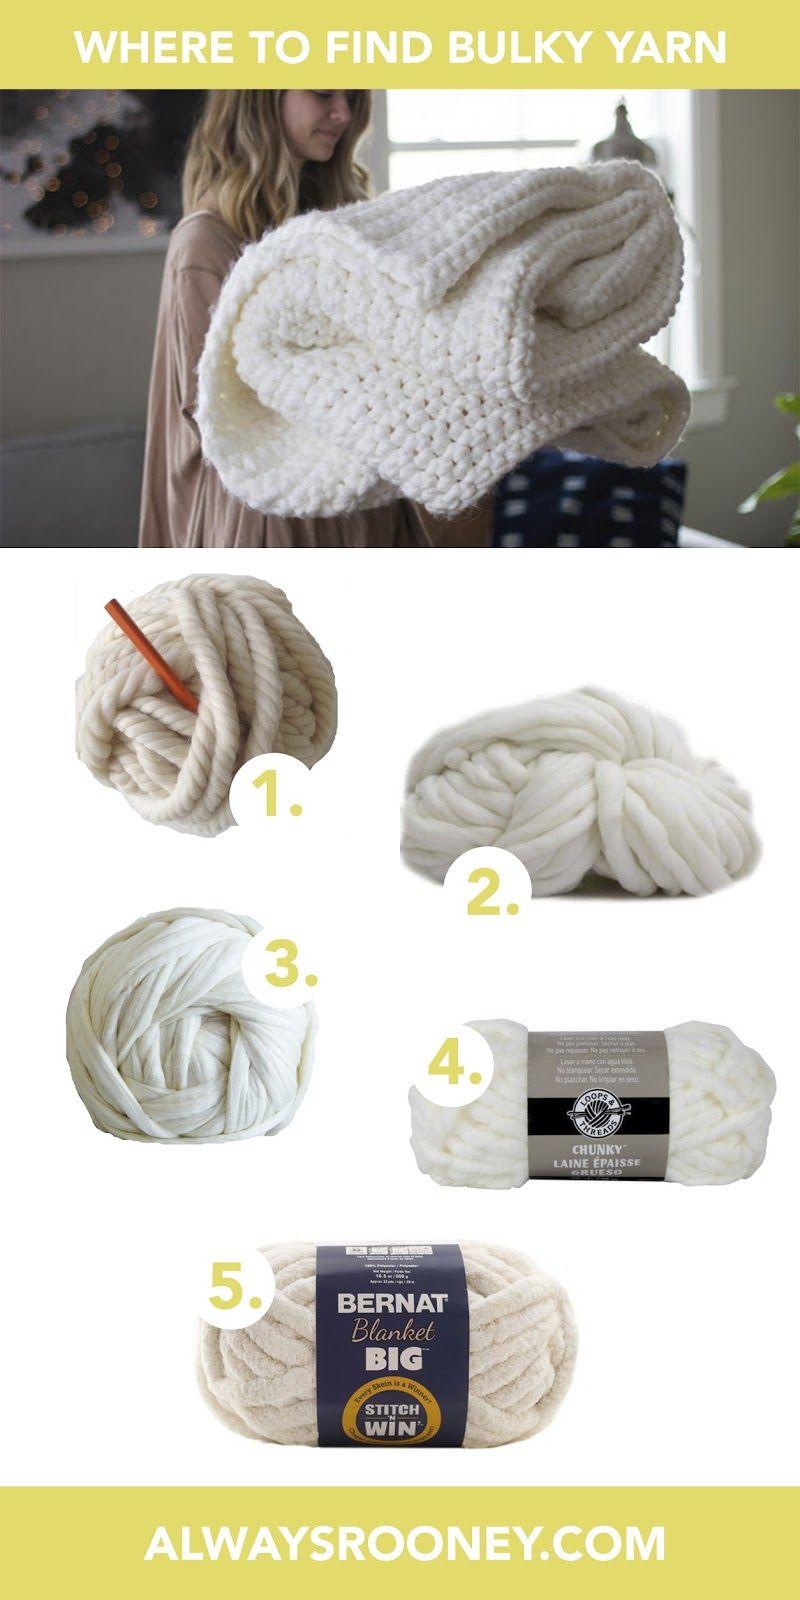 Where To Find Bulky Yarn Arm Knitting Blanket Chunky Yarn Arm Knitting